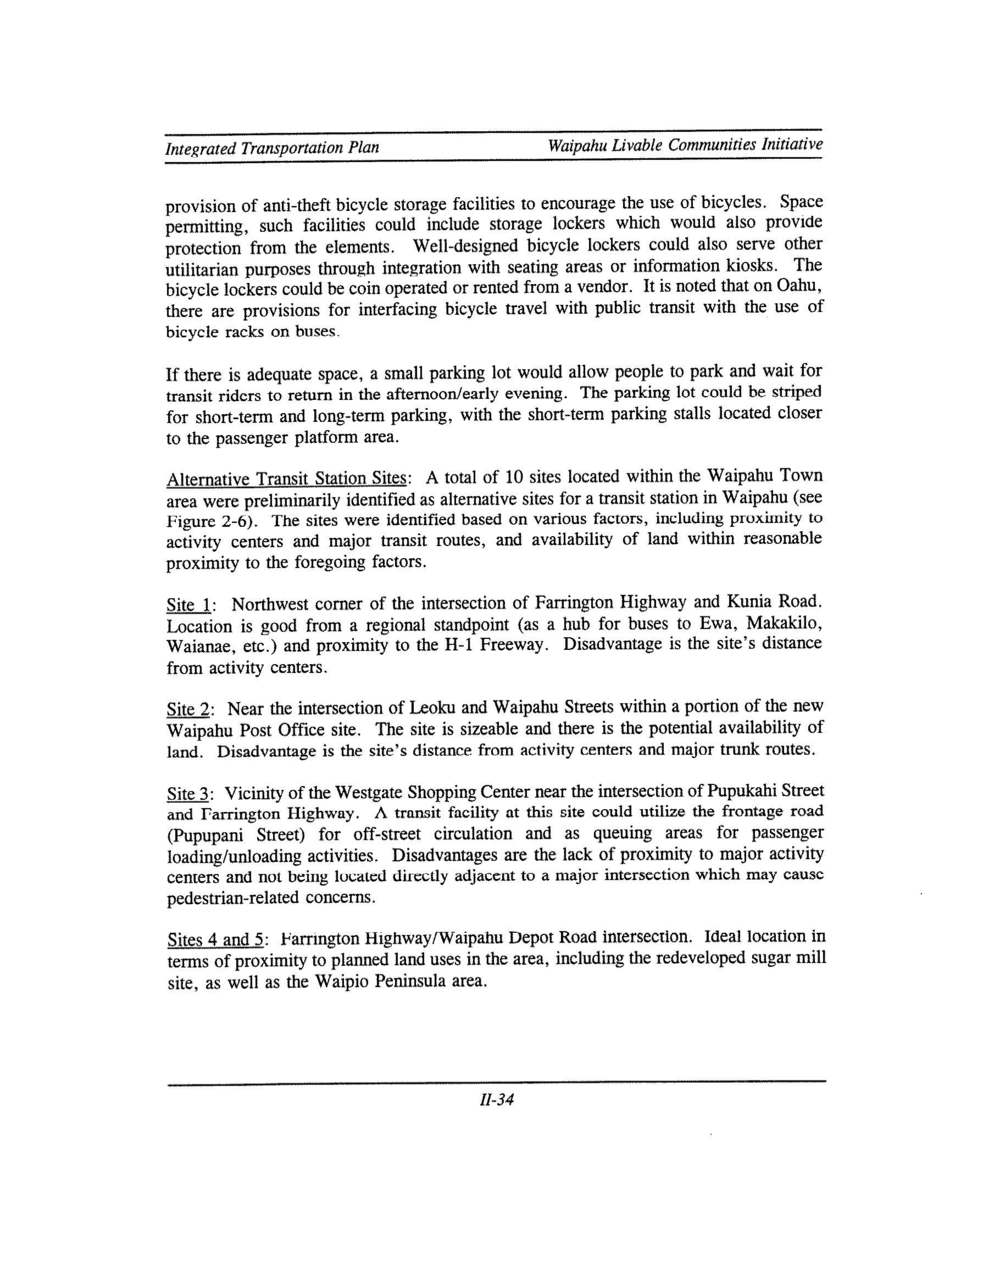 160531_WaipahuLivableCommunities(1998)_Page_049.jpg